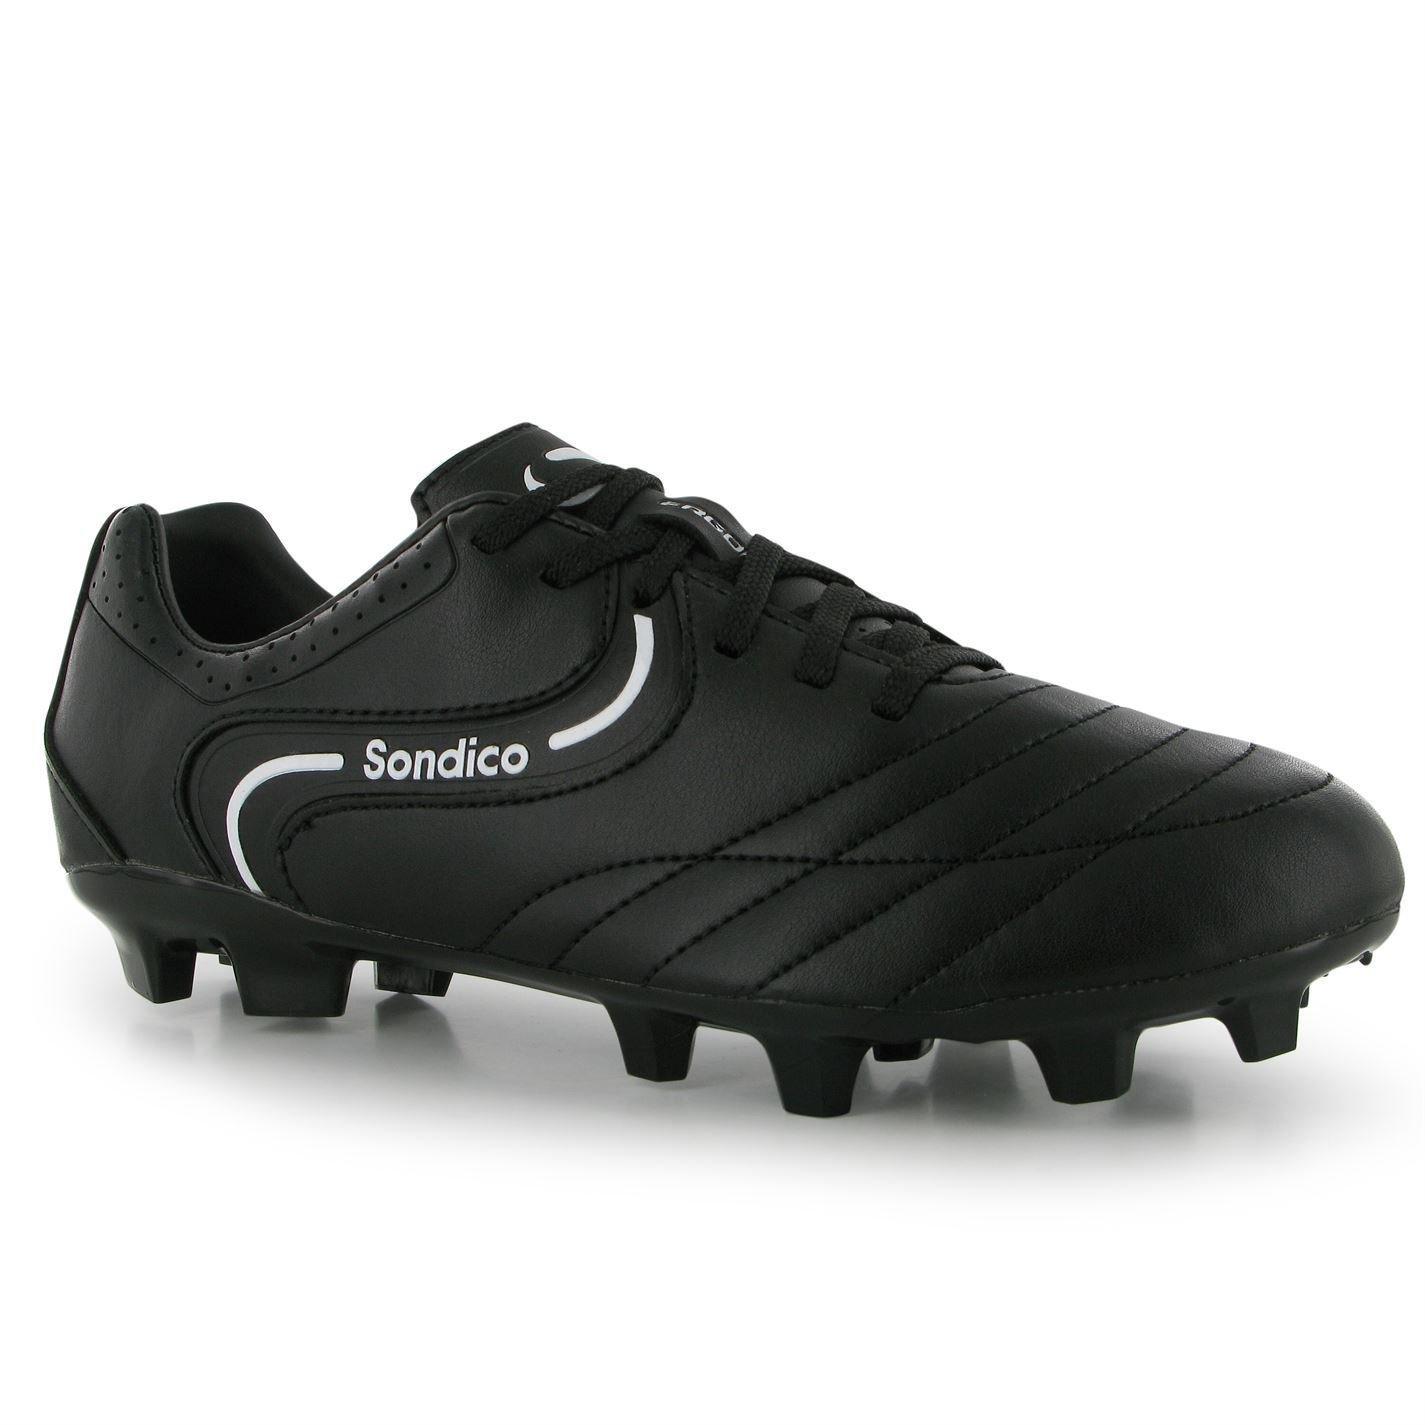 Sondico Mens Strike Ii Fg Football Boots Sports Laced Shoes Footwear